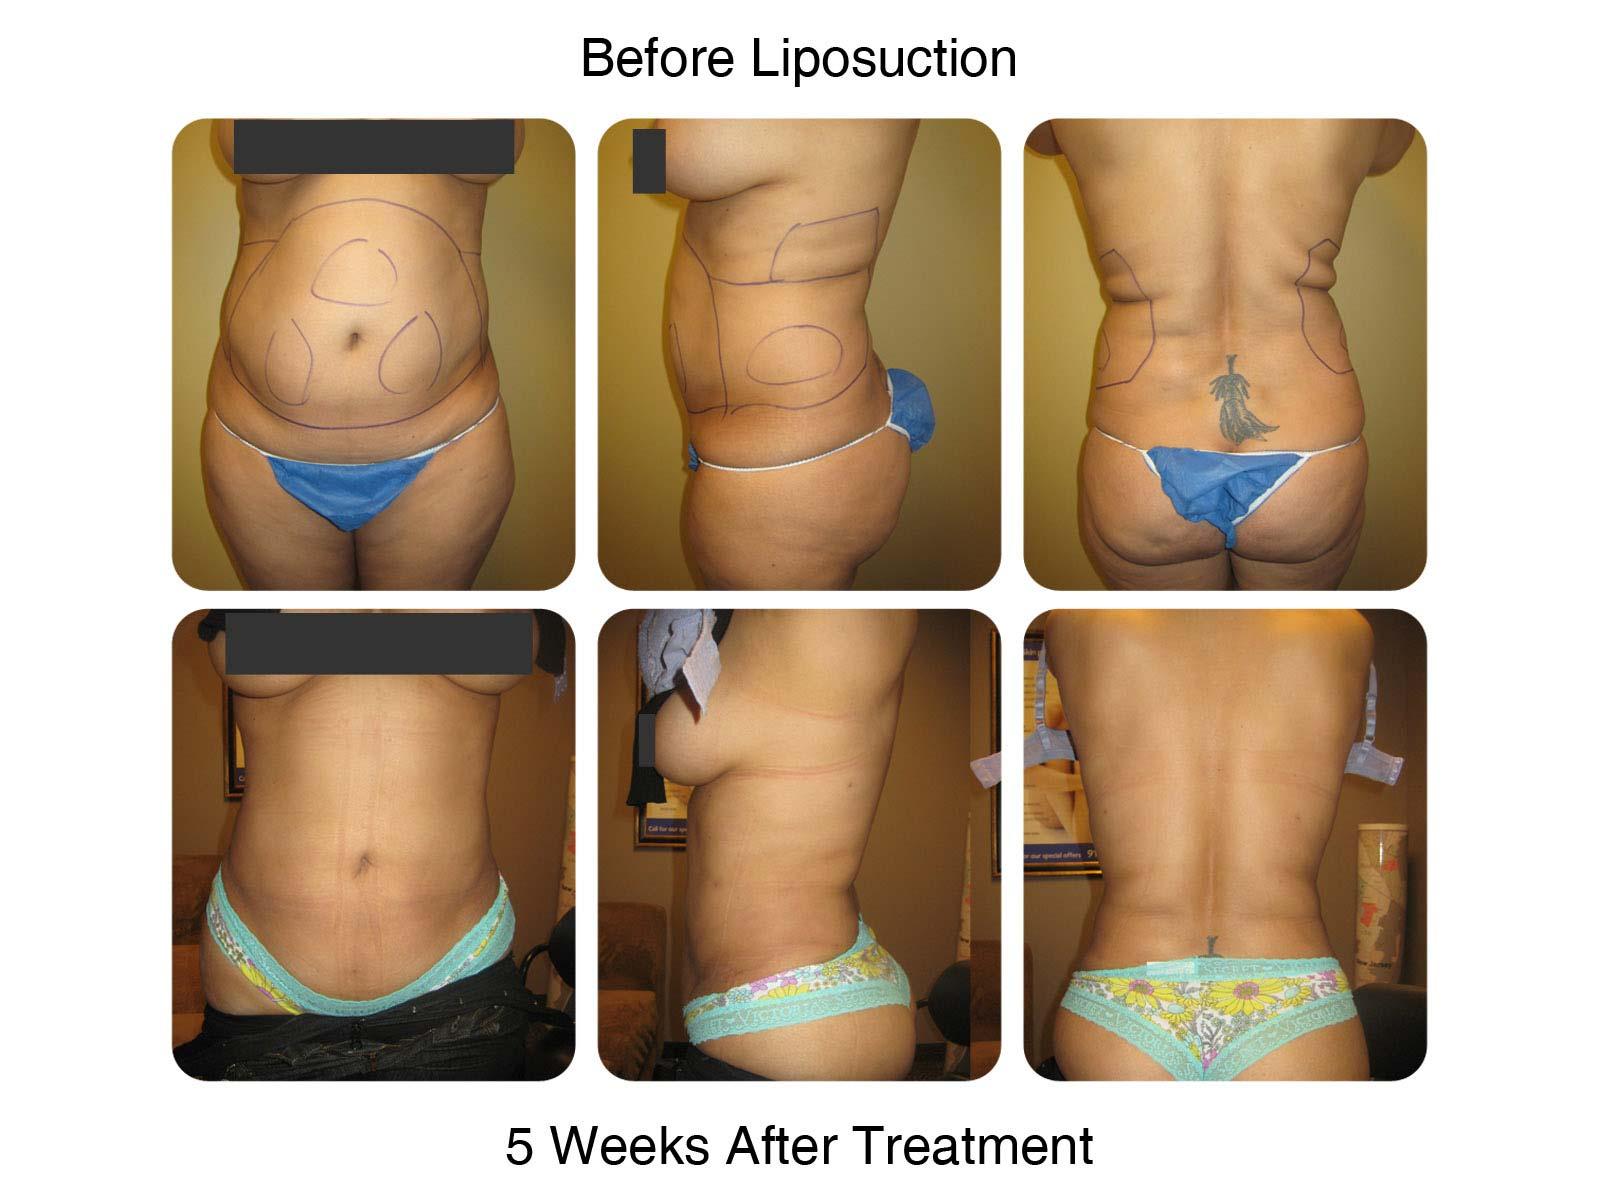 Liposuction Procedure at New Radiance